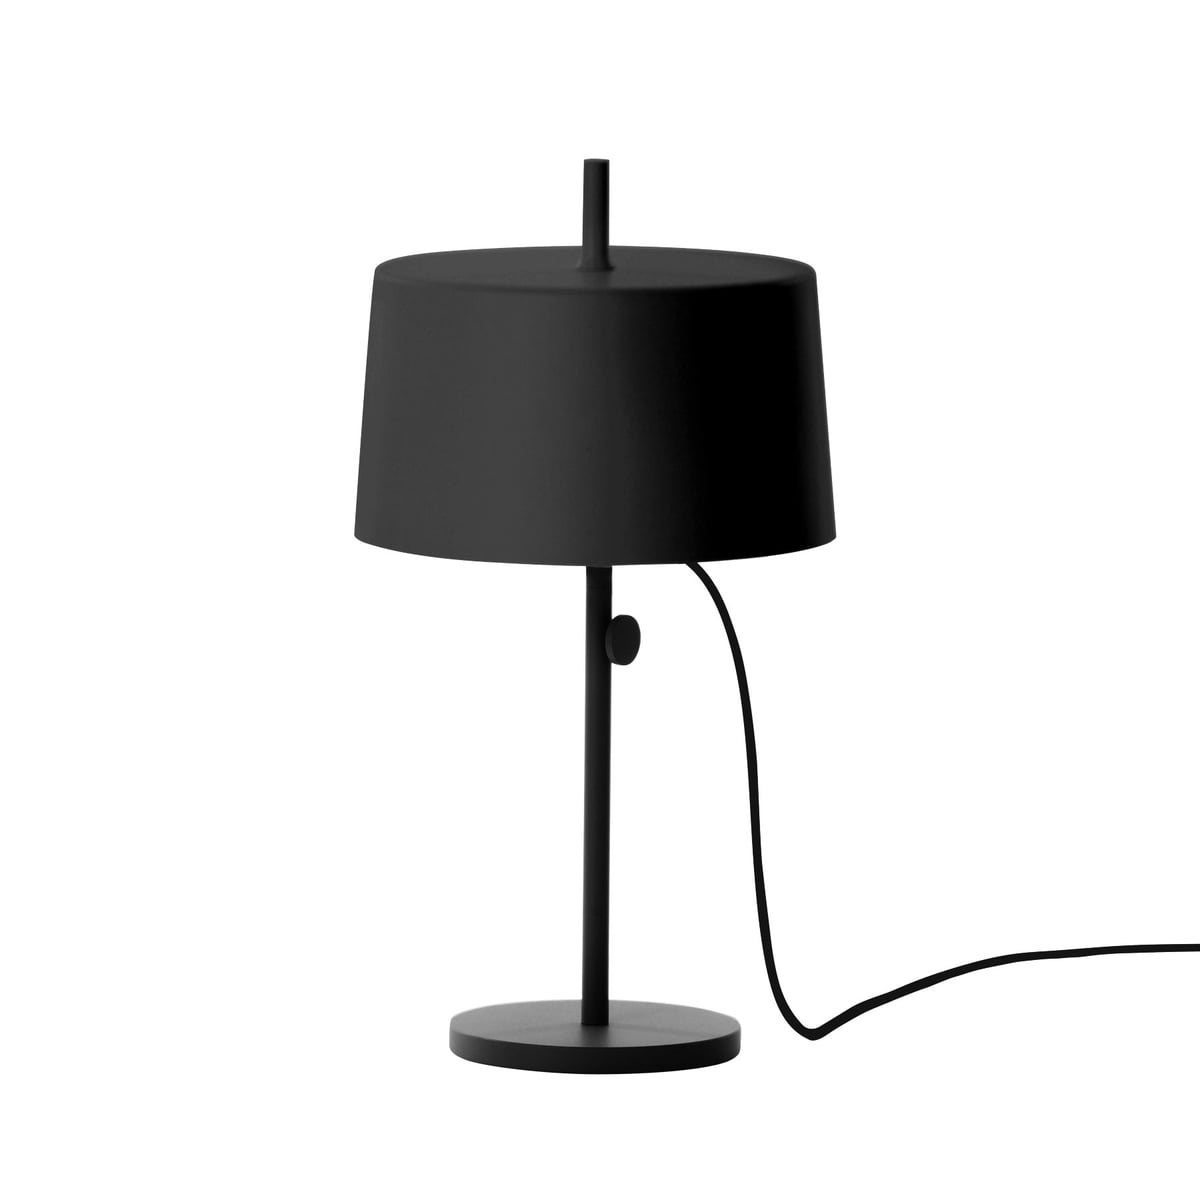 Wästberg   Nendo Table Lamp Cylinder W132t2, Black